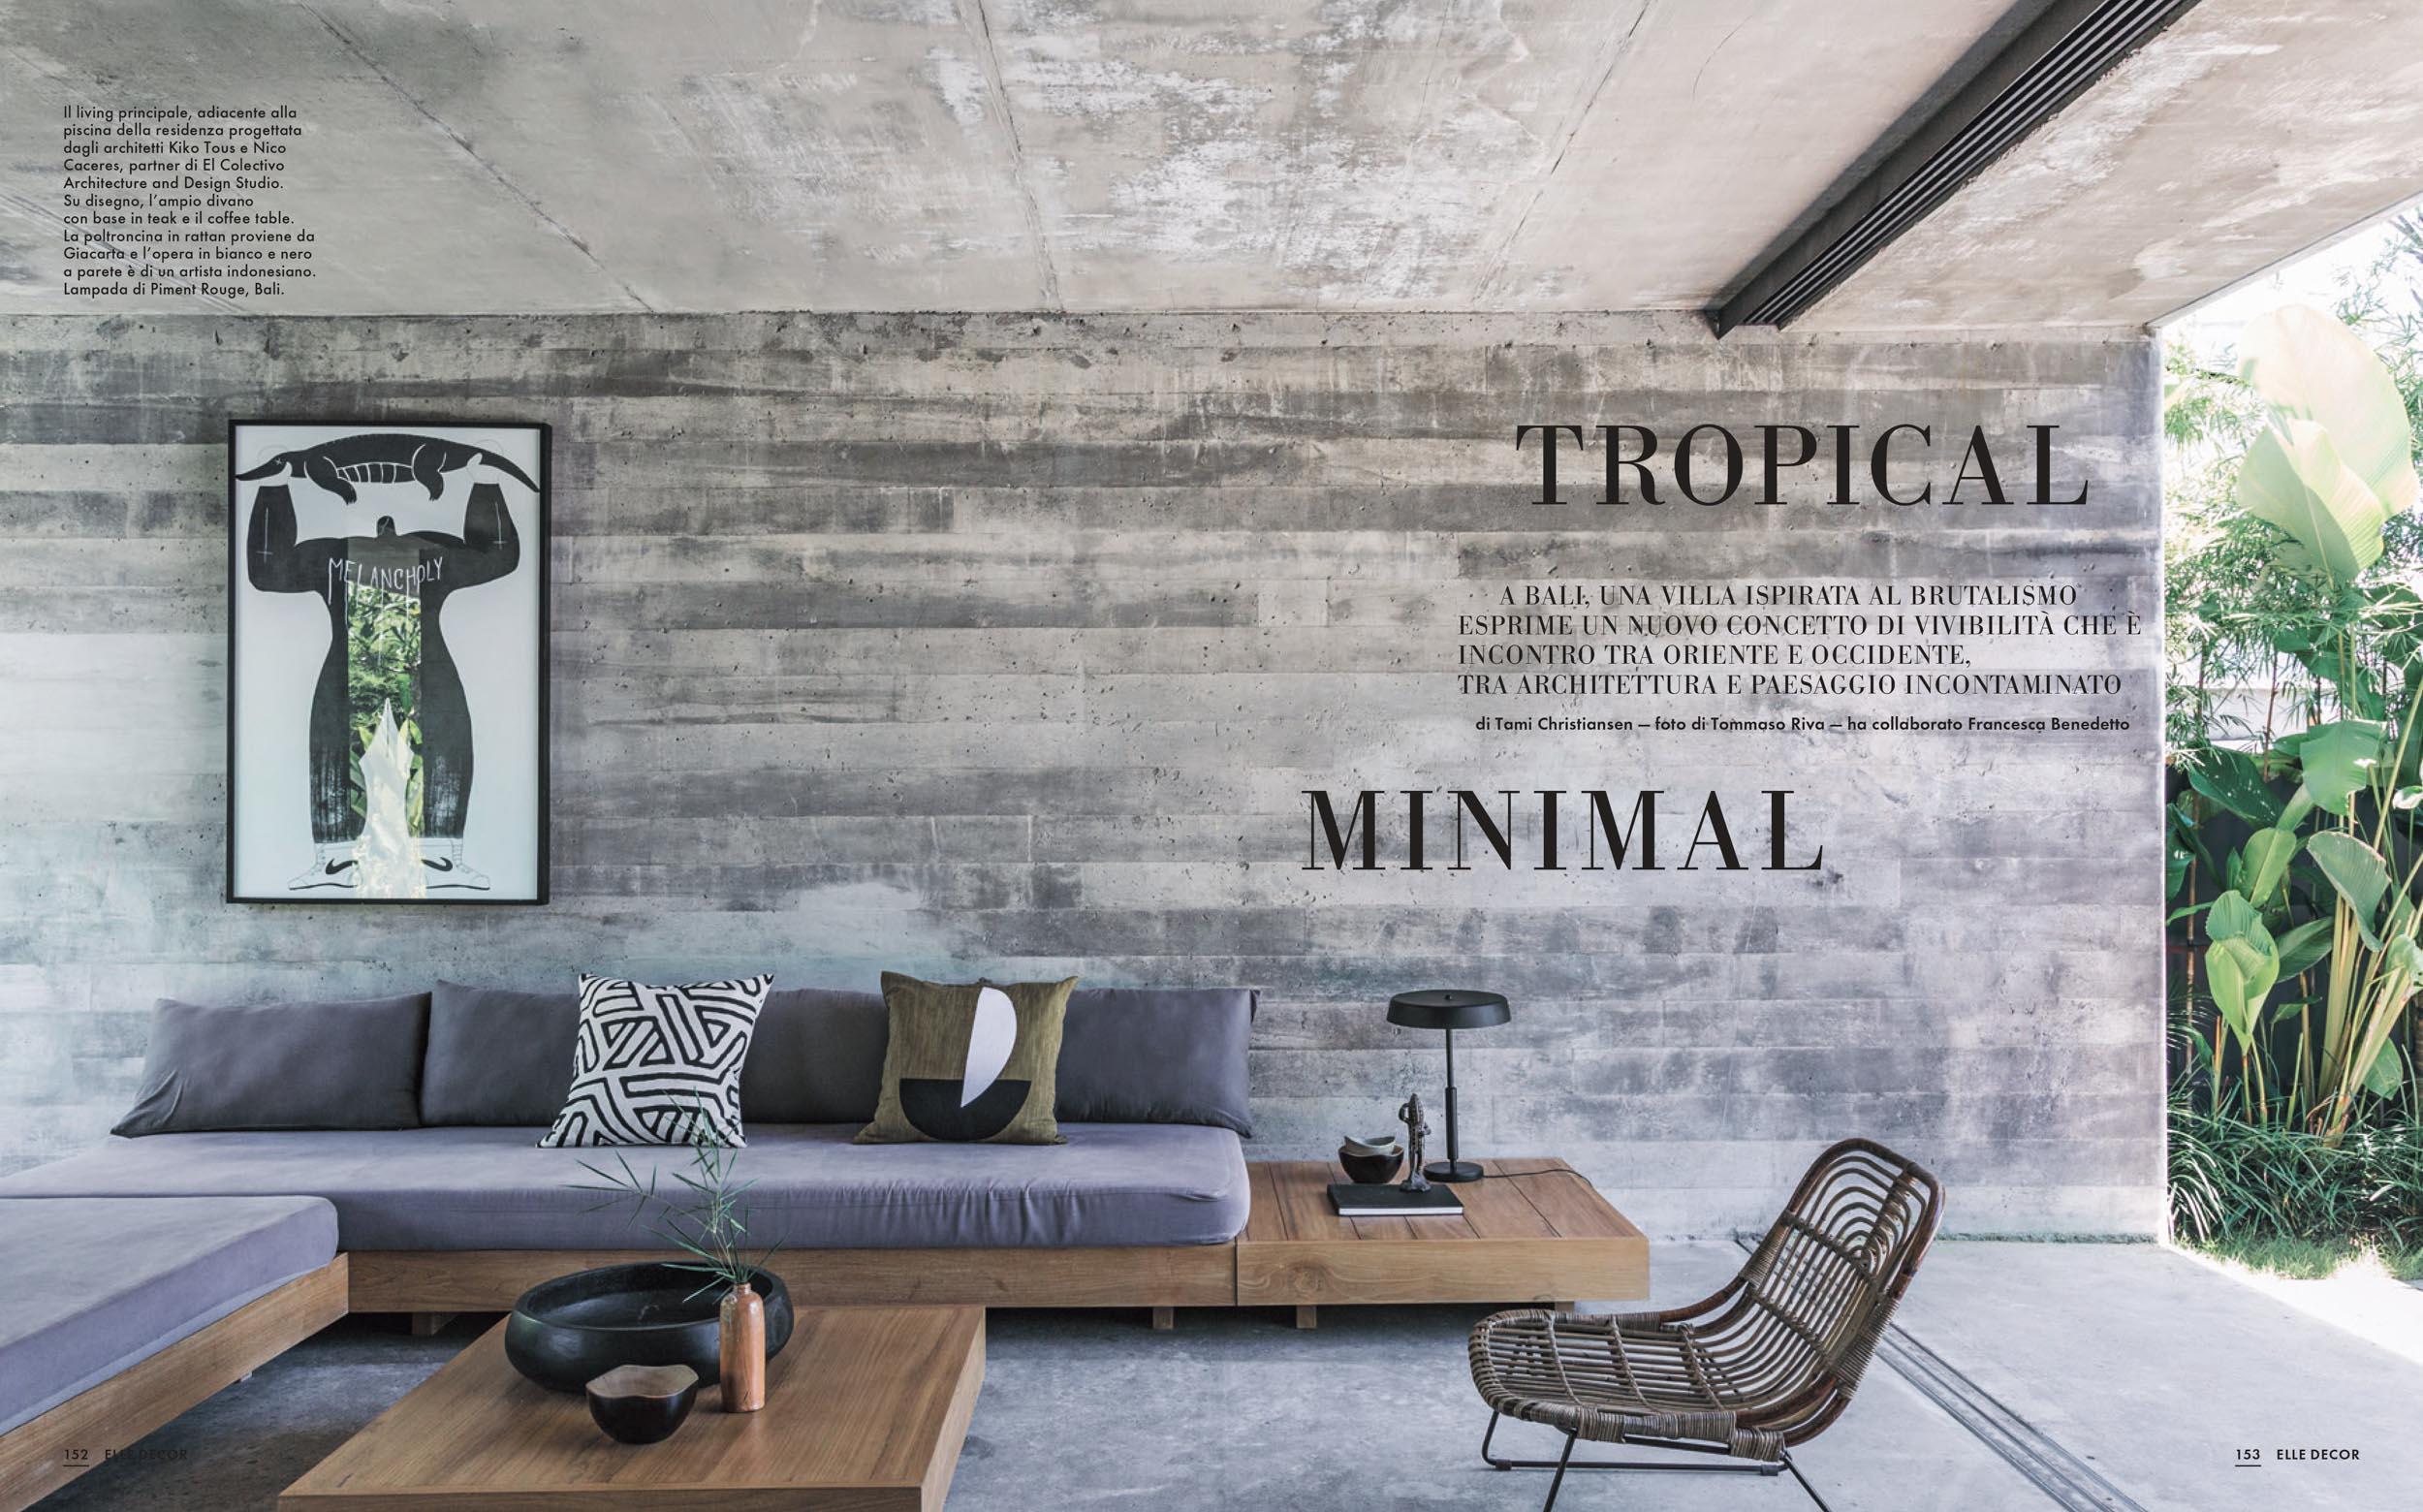 Elle-Decor-Italia-Tommaso-riva-tami-christiansen-francesca-benedetto-bali-interiors-brutalism (1 of 5).jpg